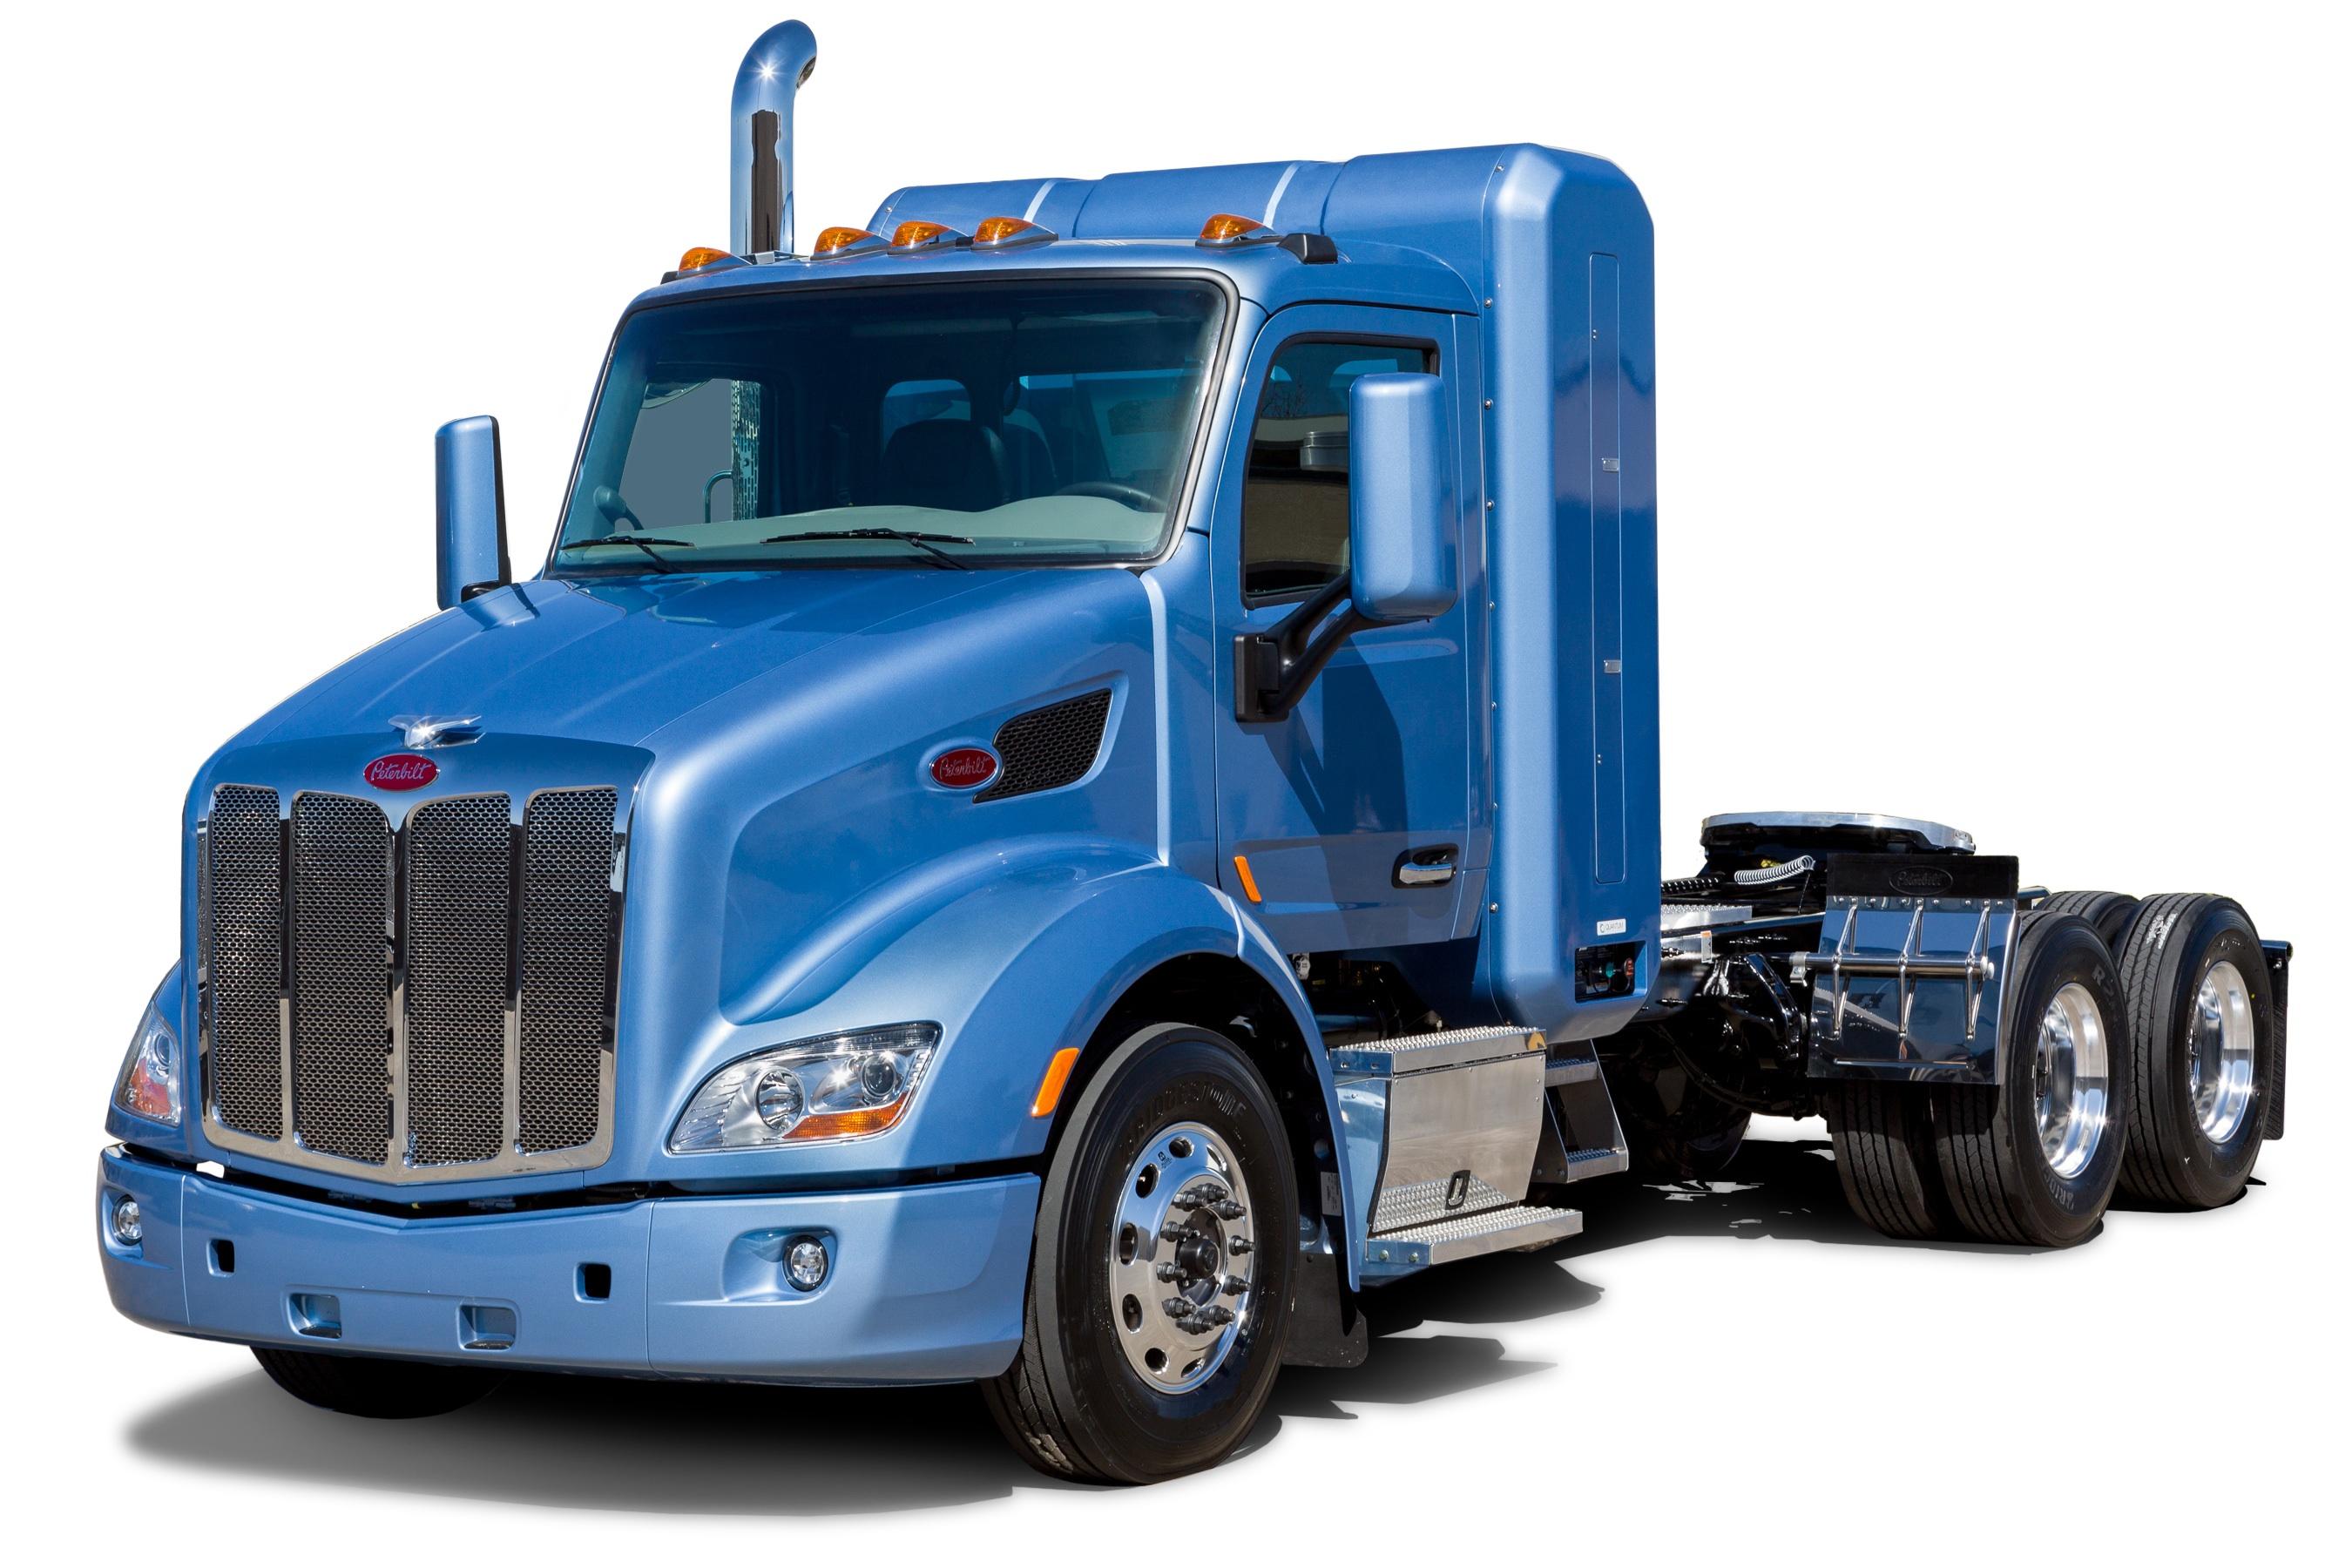 Peterbilt Adds Natural Gas Option to Models 579, 567